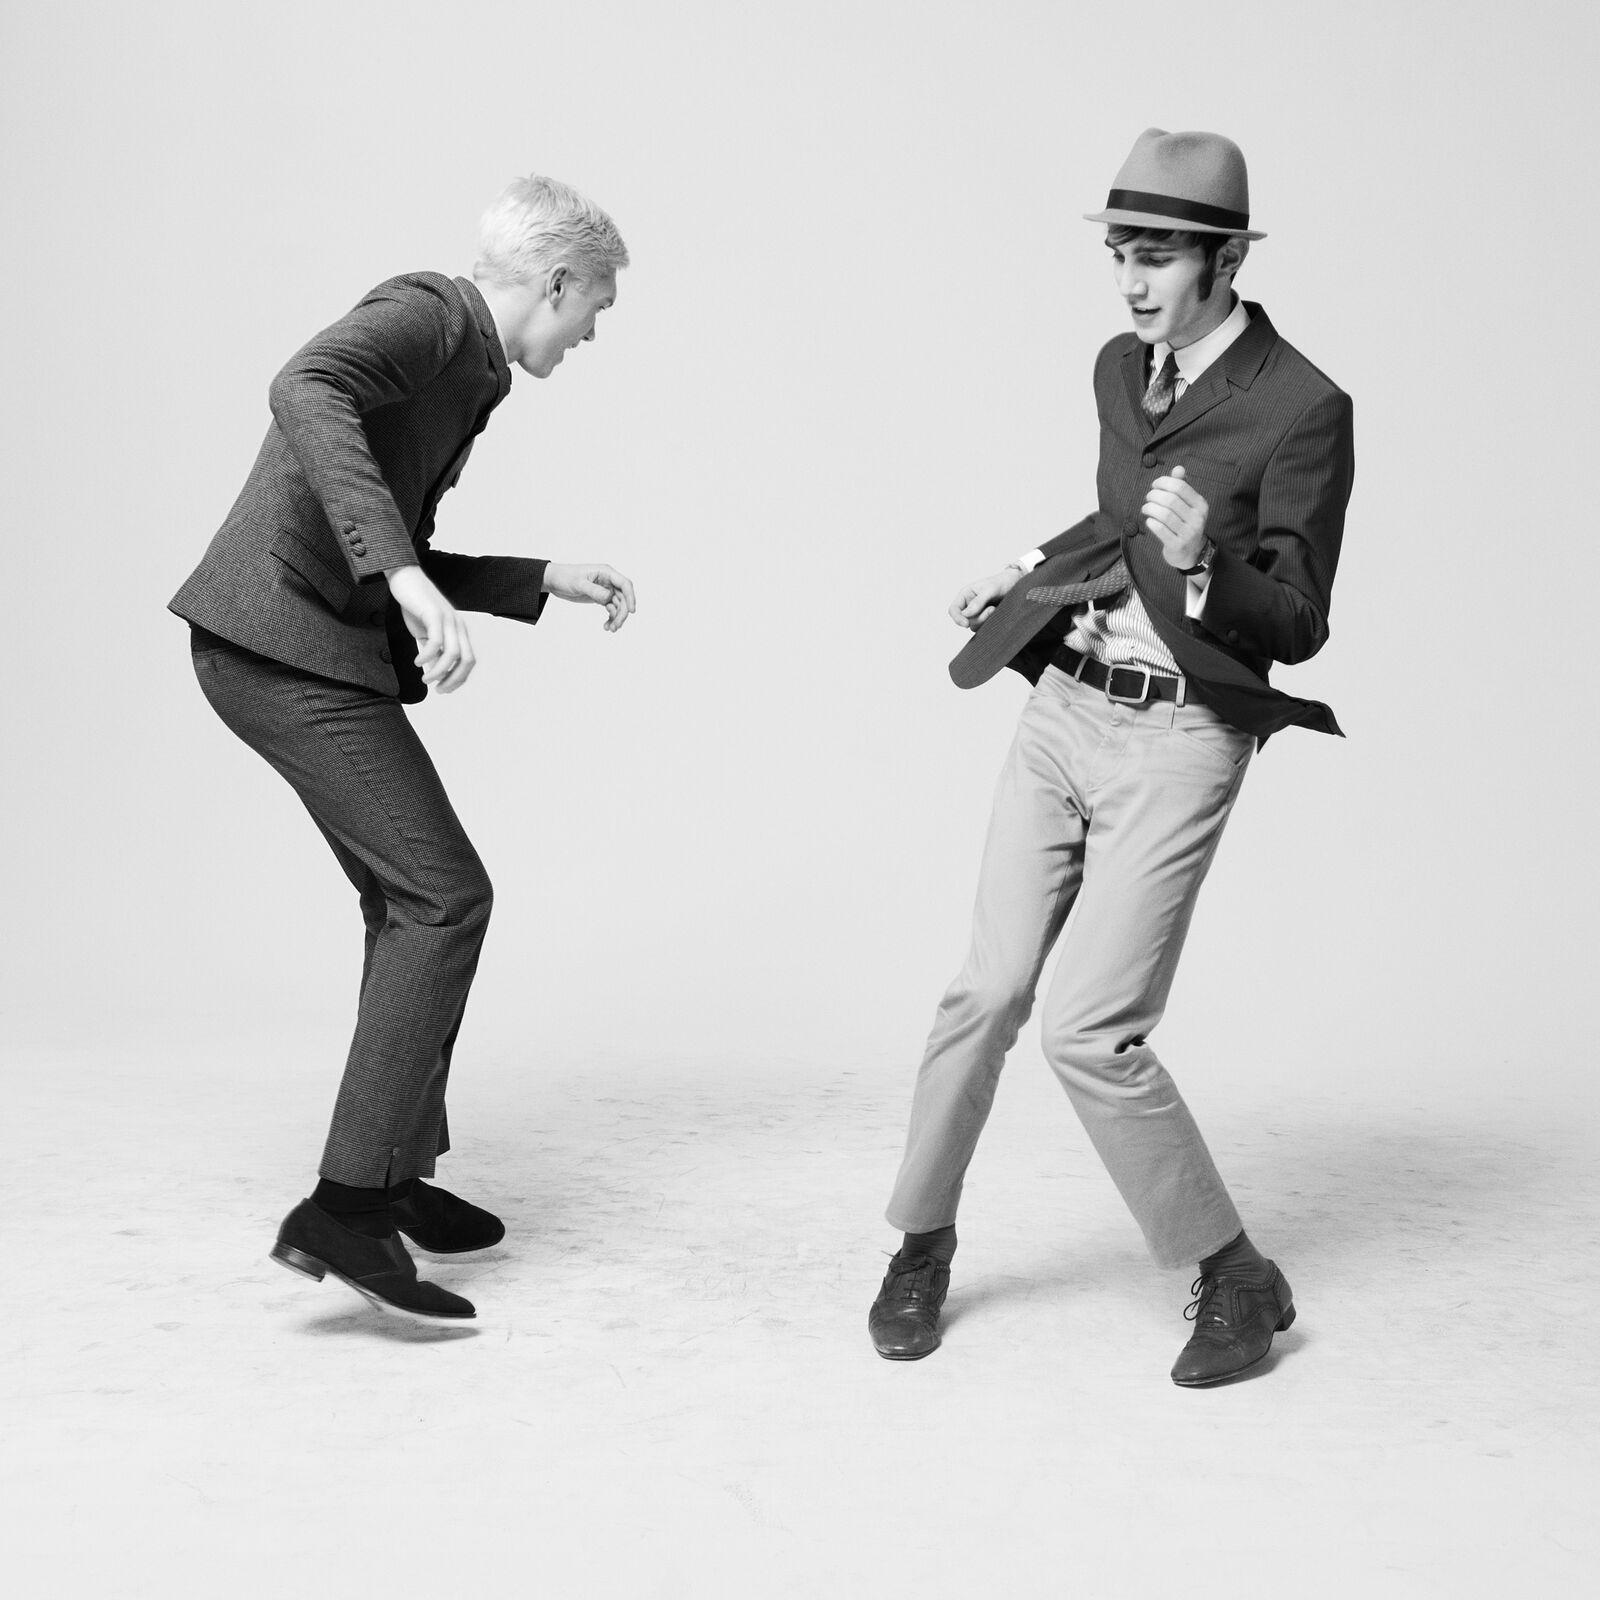 Scott & Tomas #4